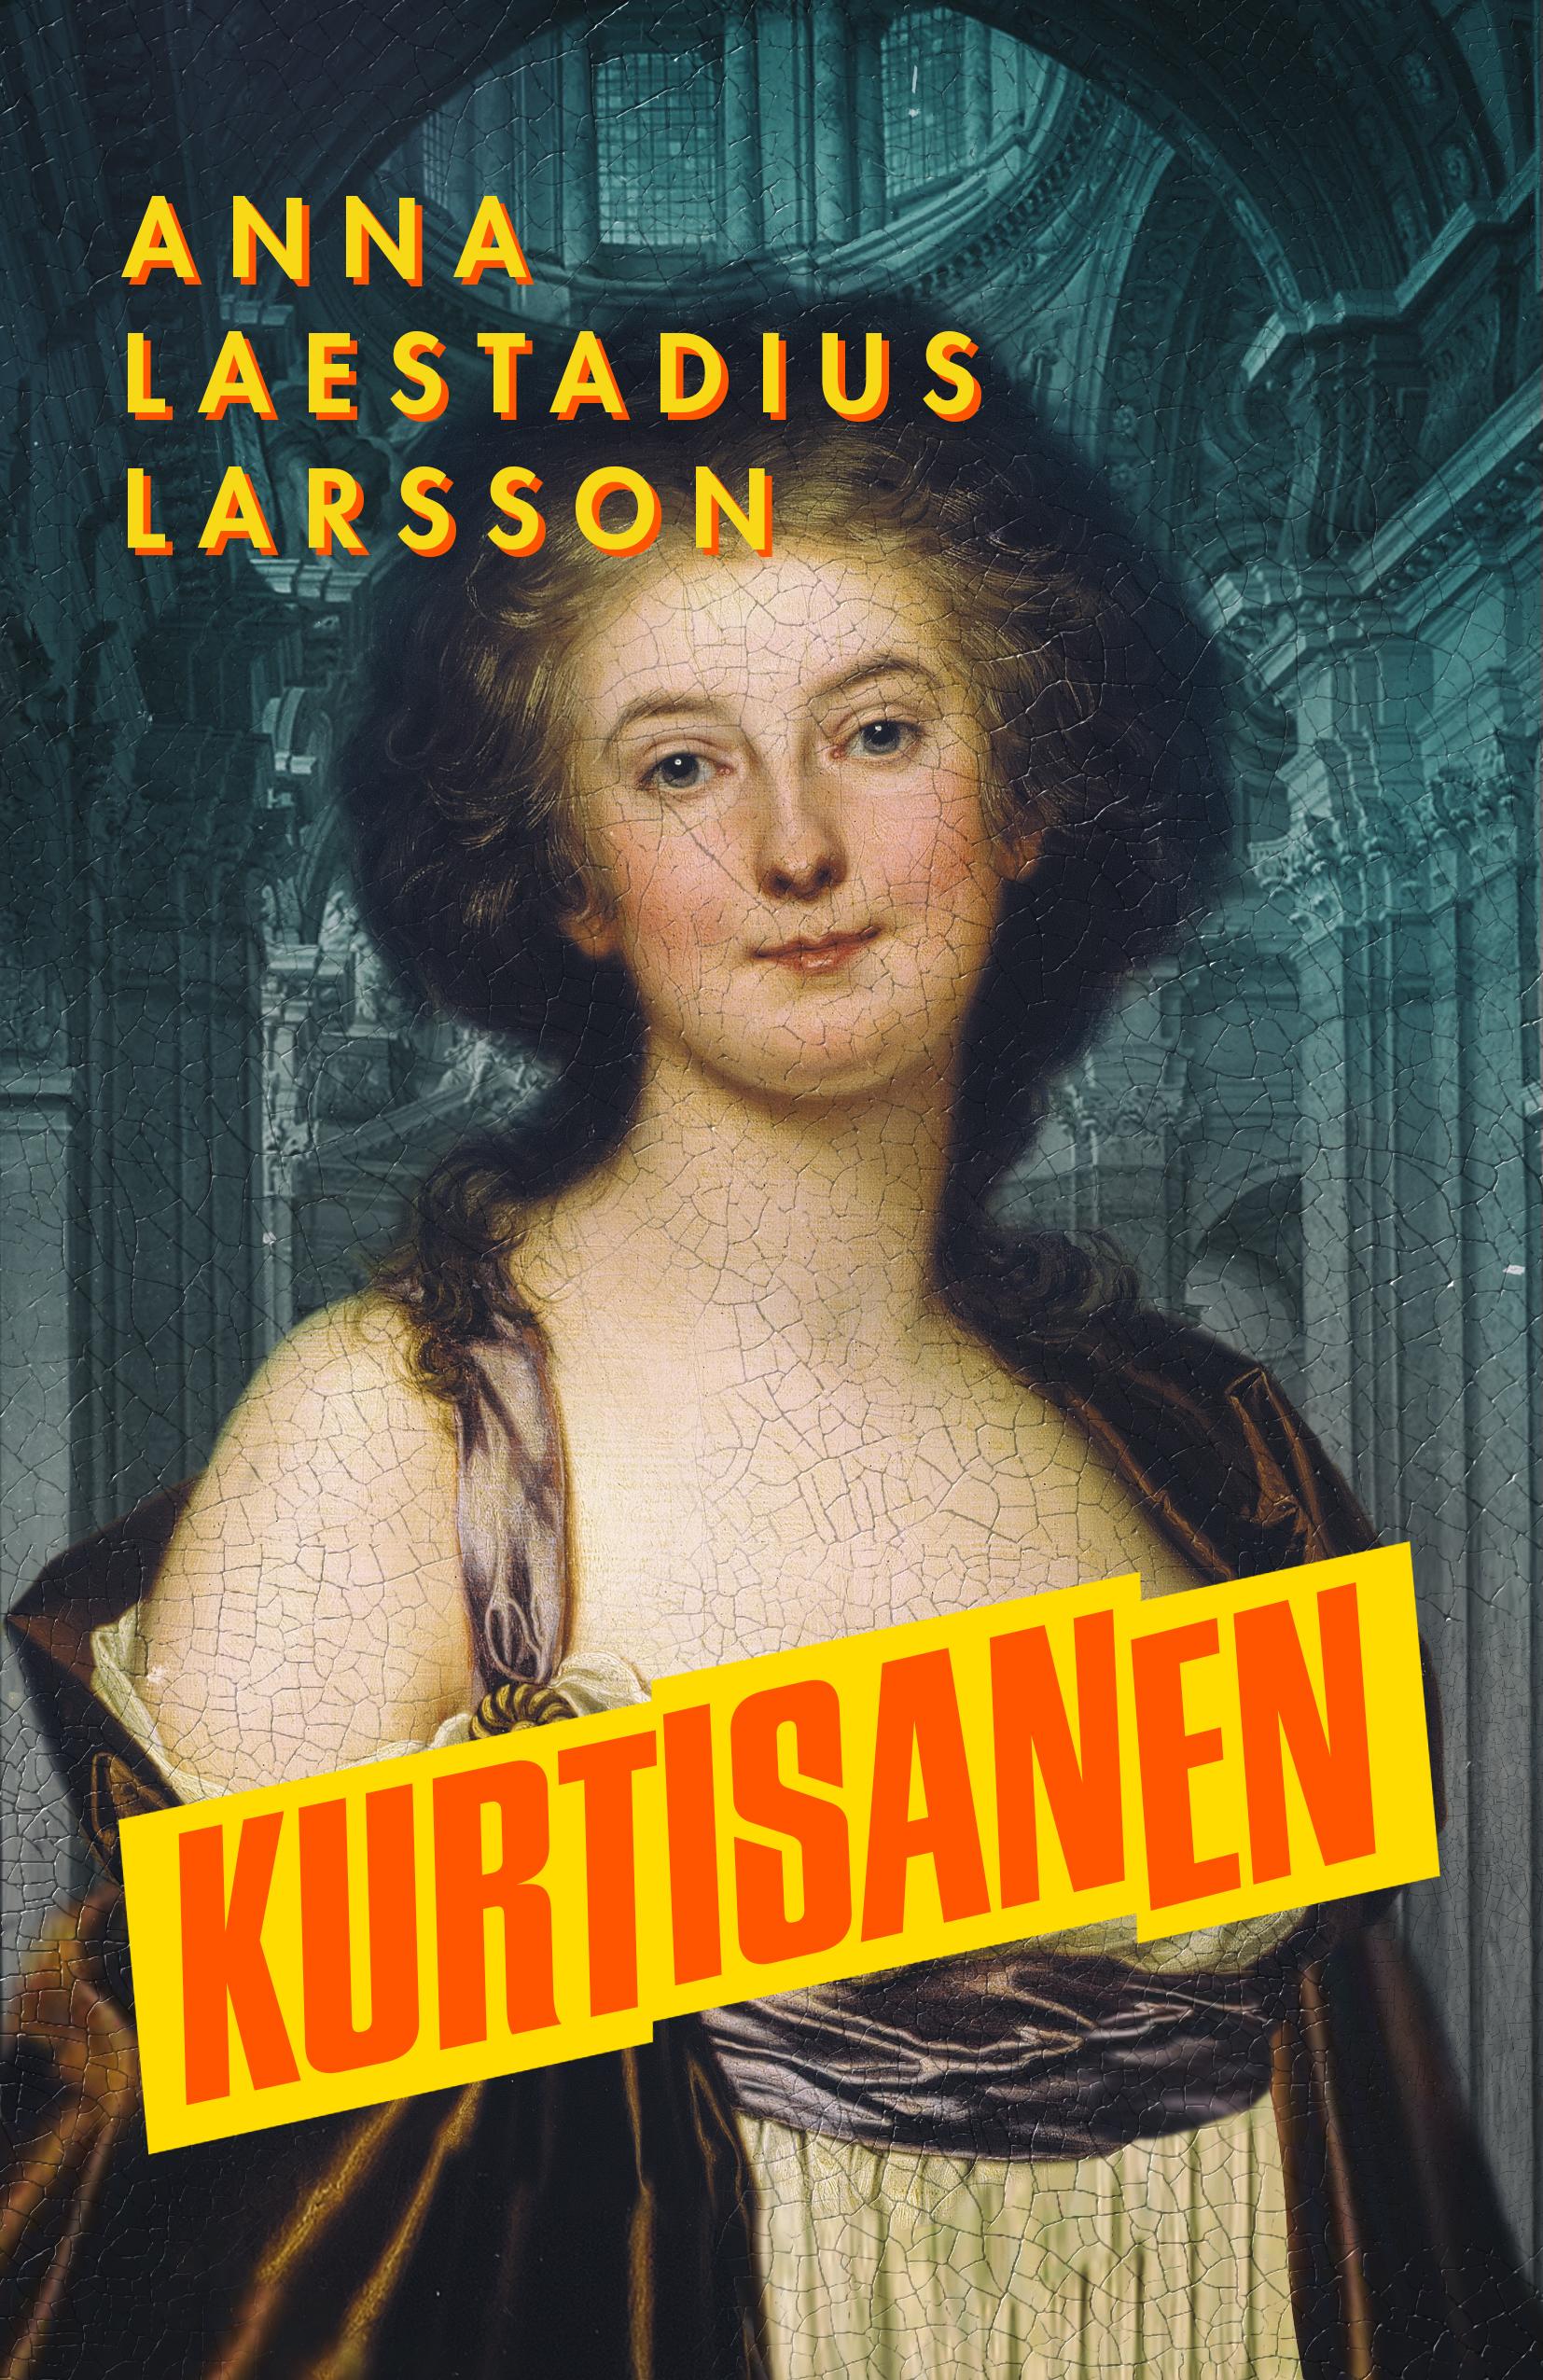 kurtisanen-inb.jpg